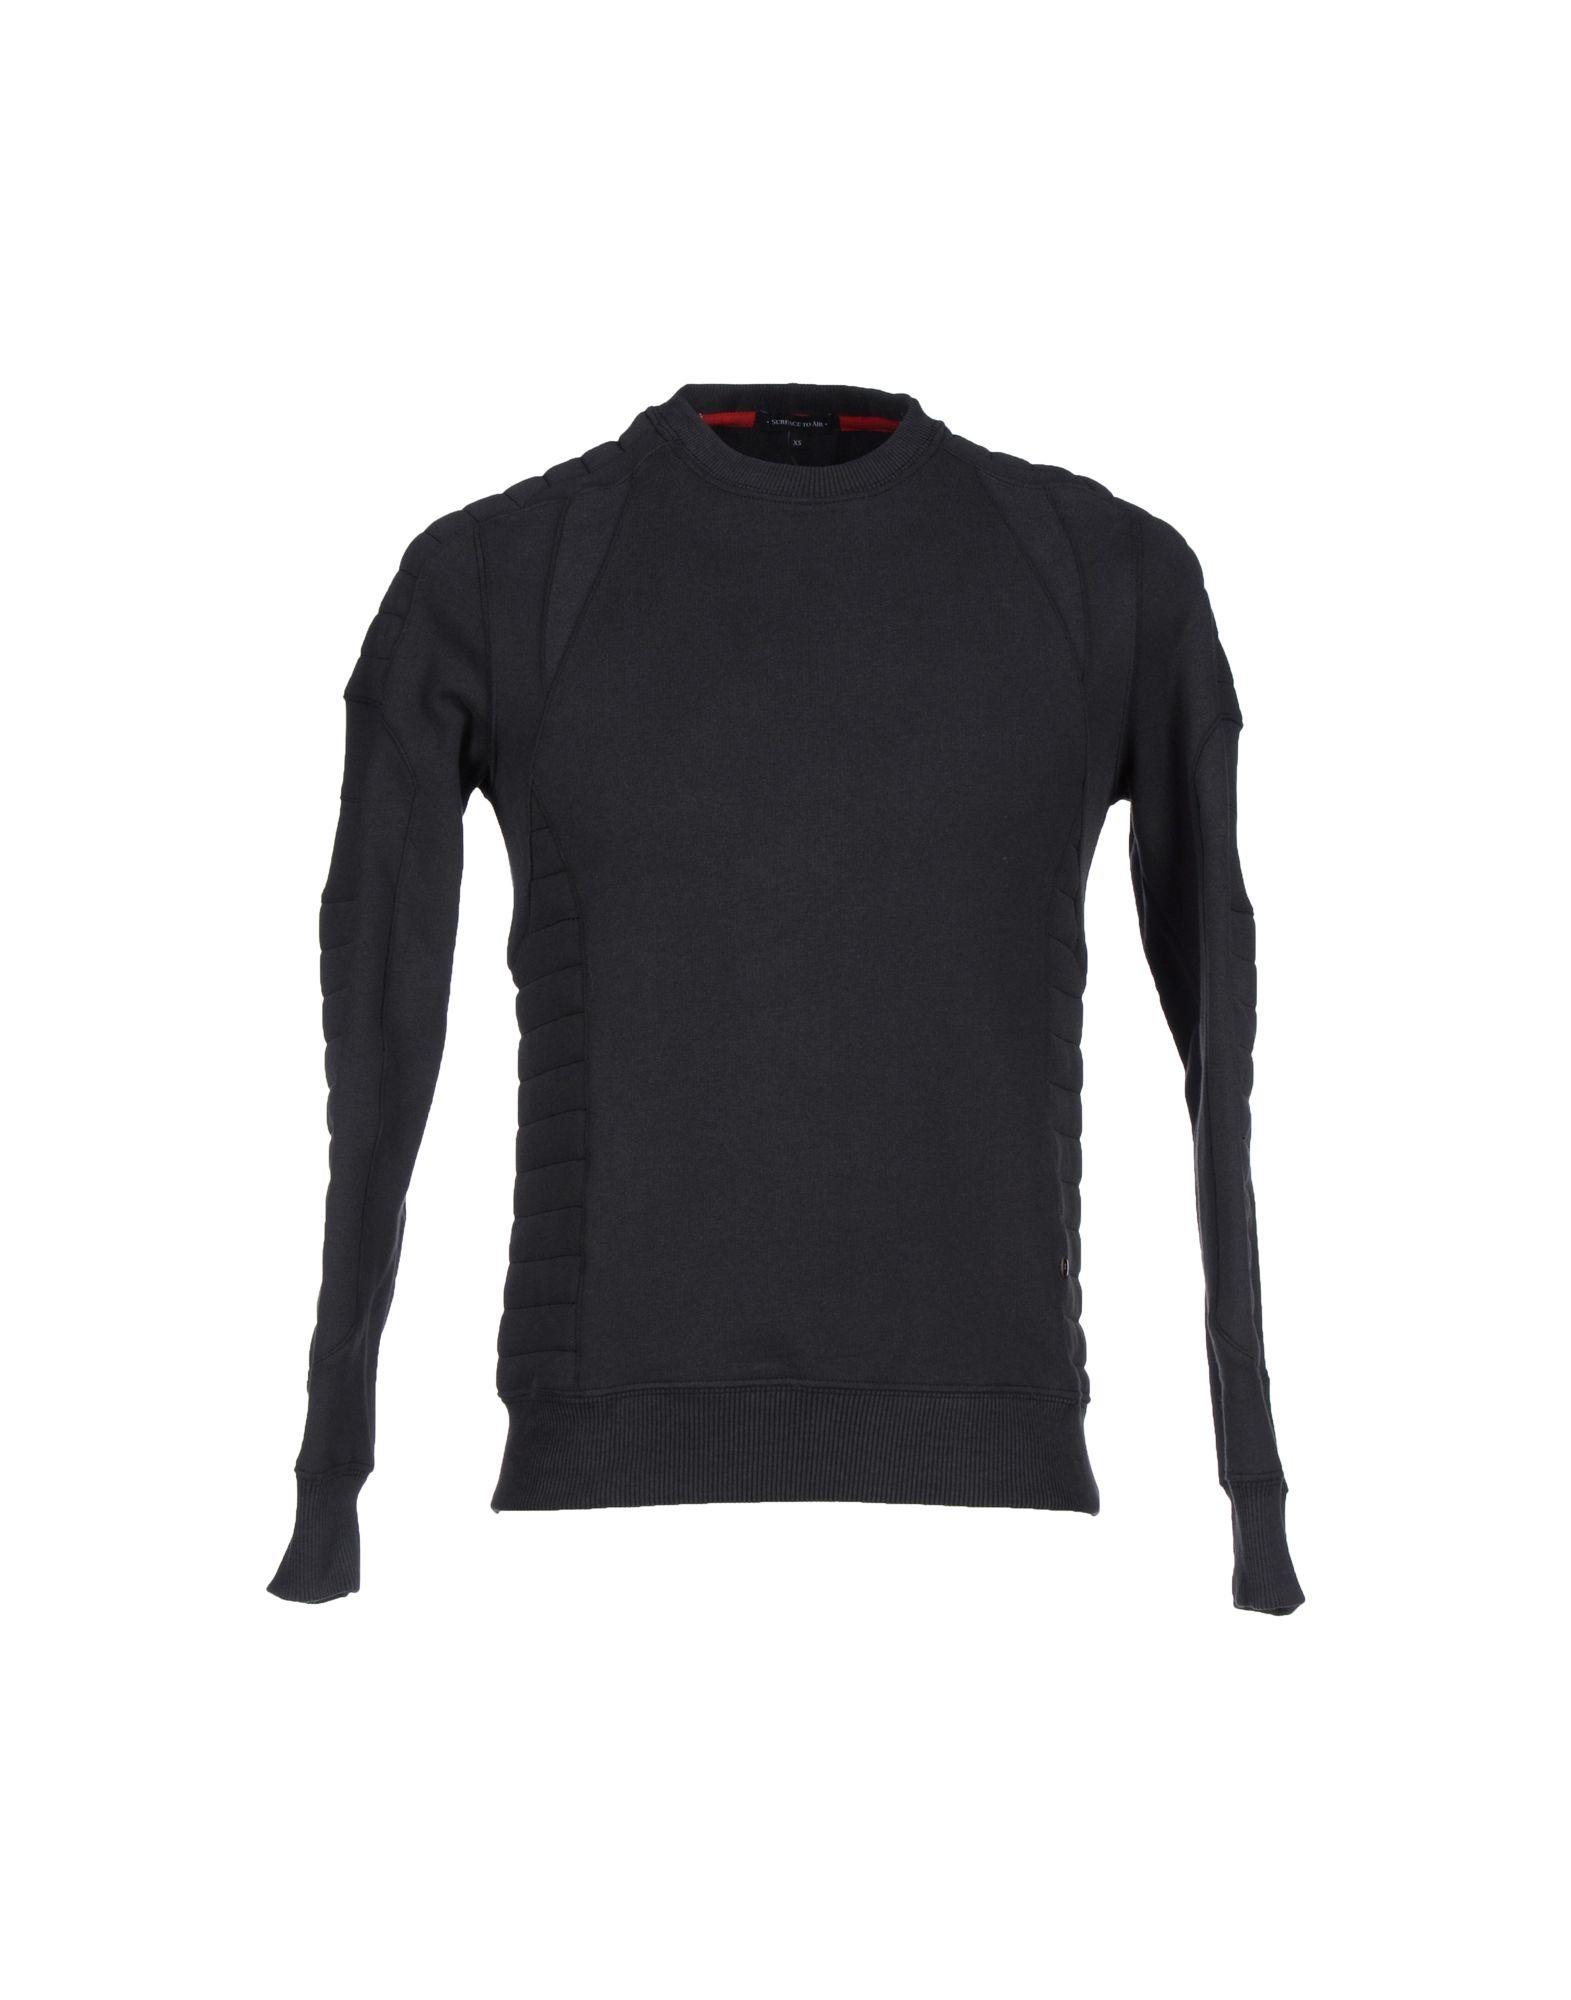 SURFACE TO AIR Sweatshirt in Black